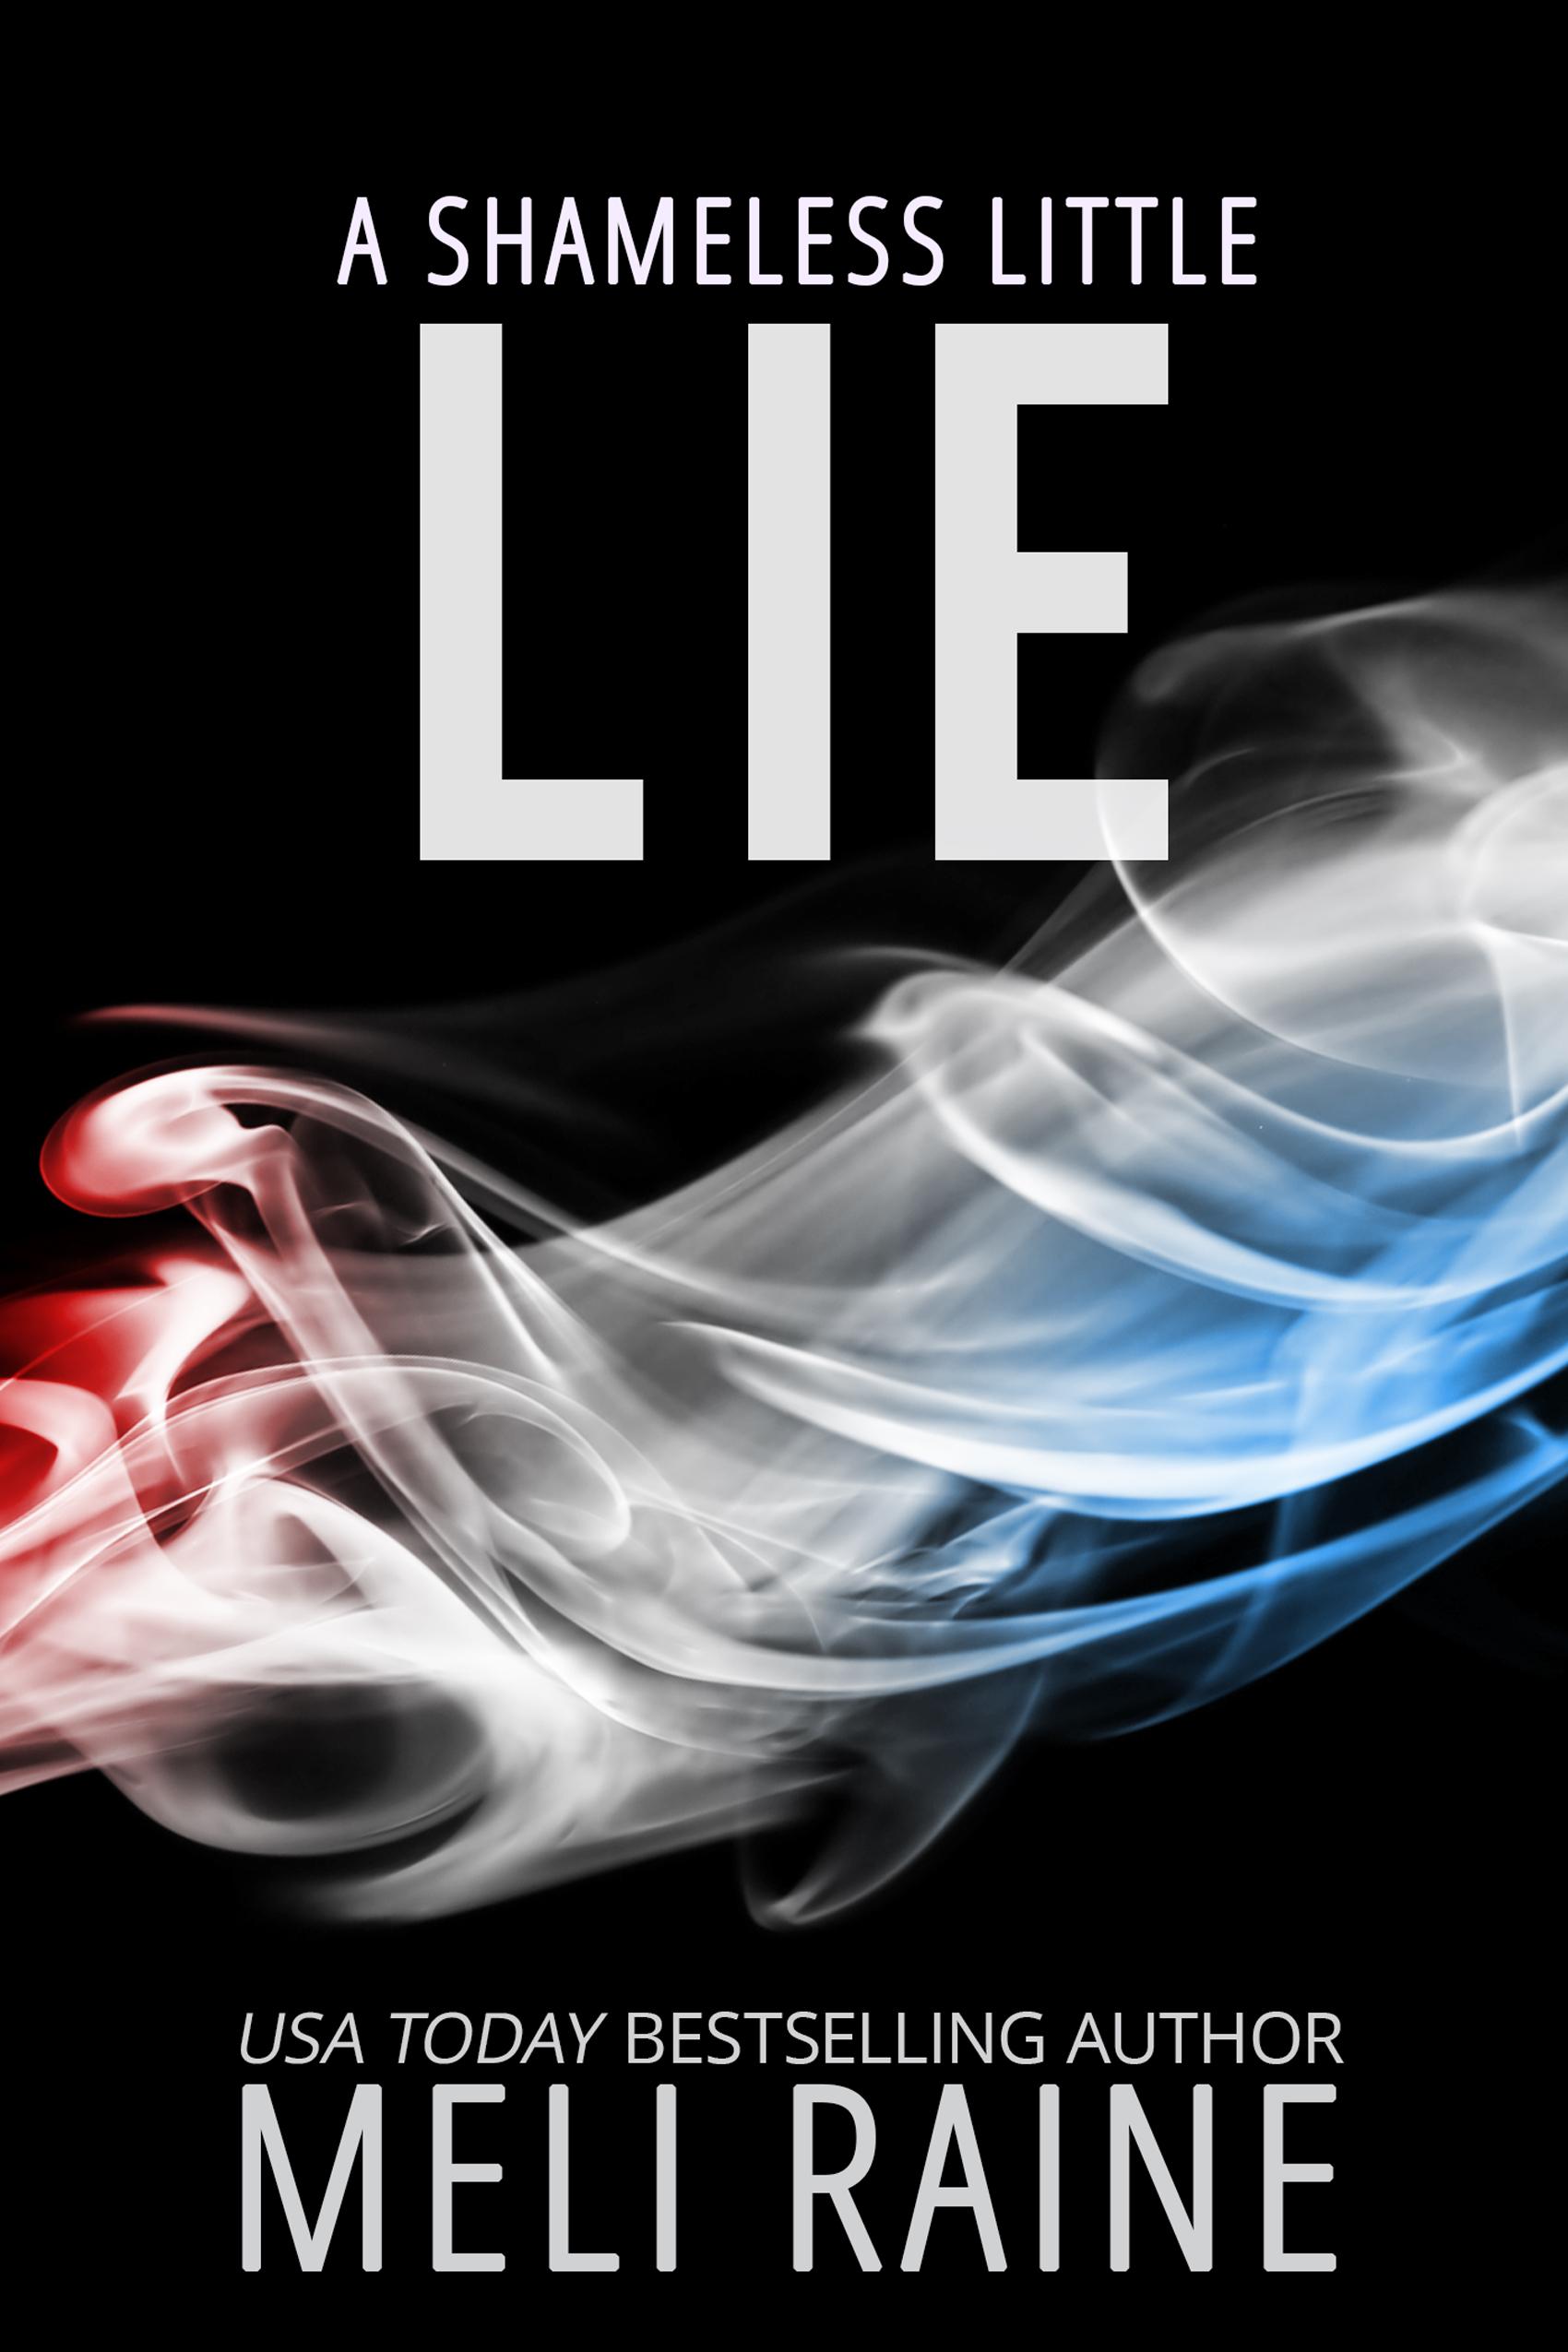 Review: A Shameless Little Lie by Meli Raine